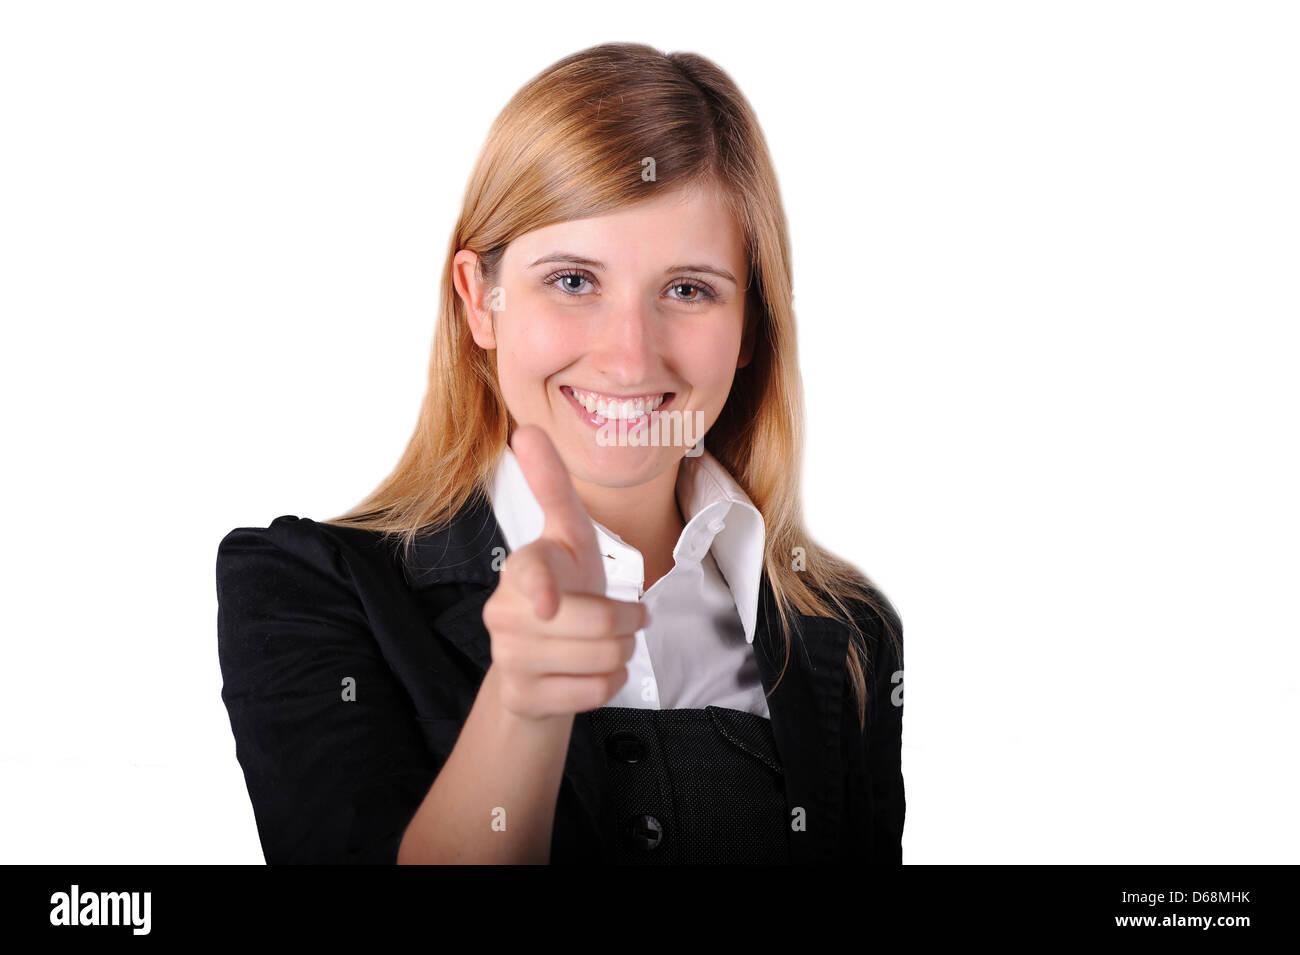 Business women pointing trigger finger - Stock Image